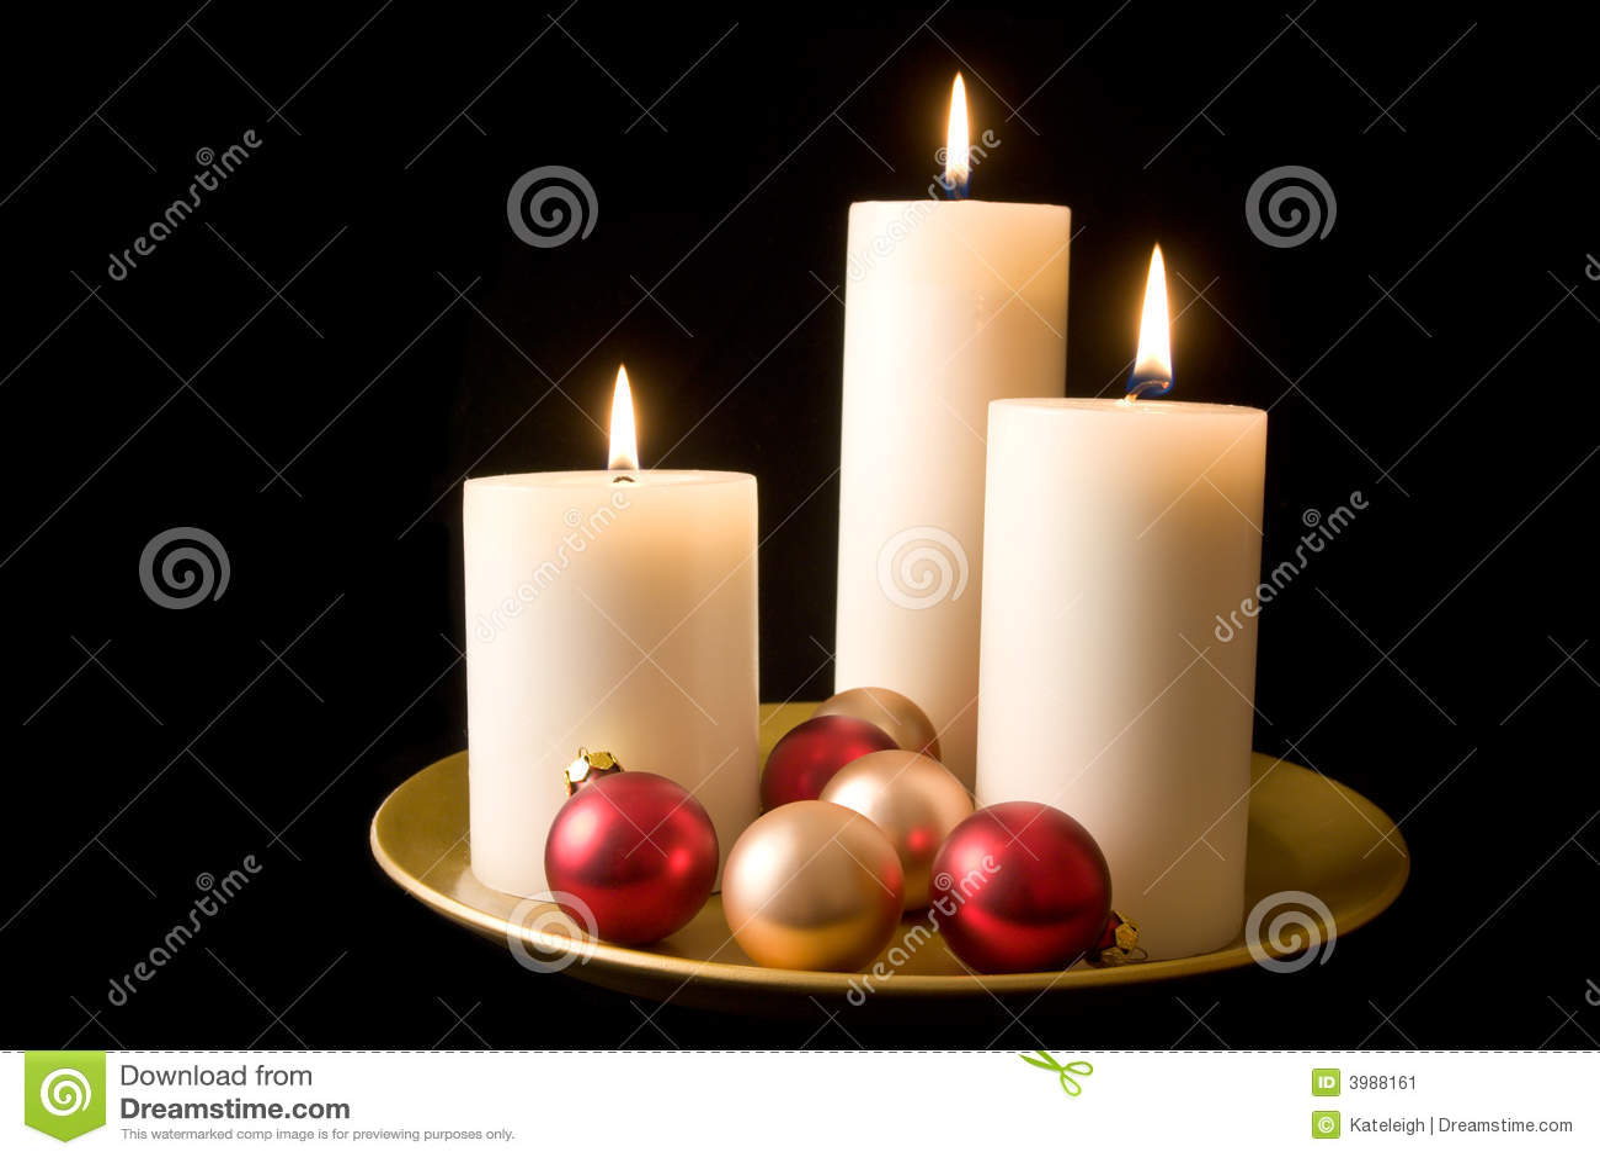 Indicador decorativo da vela